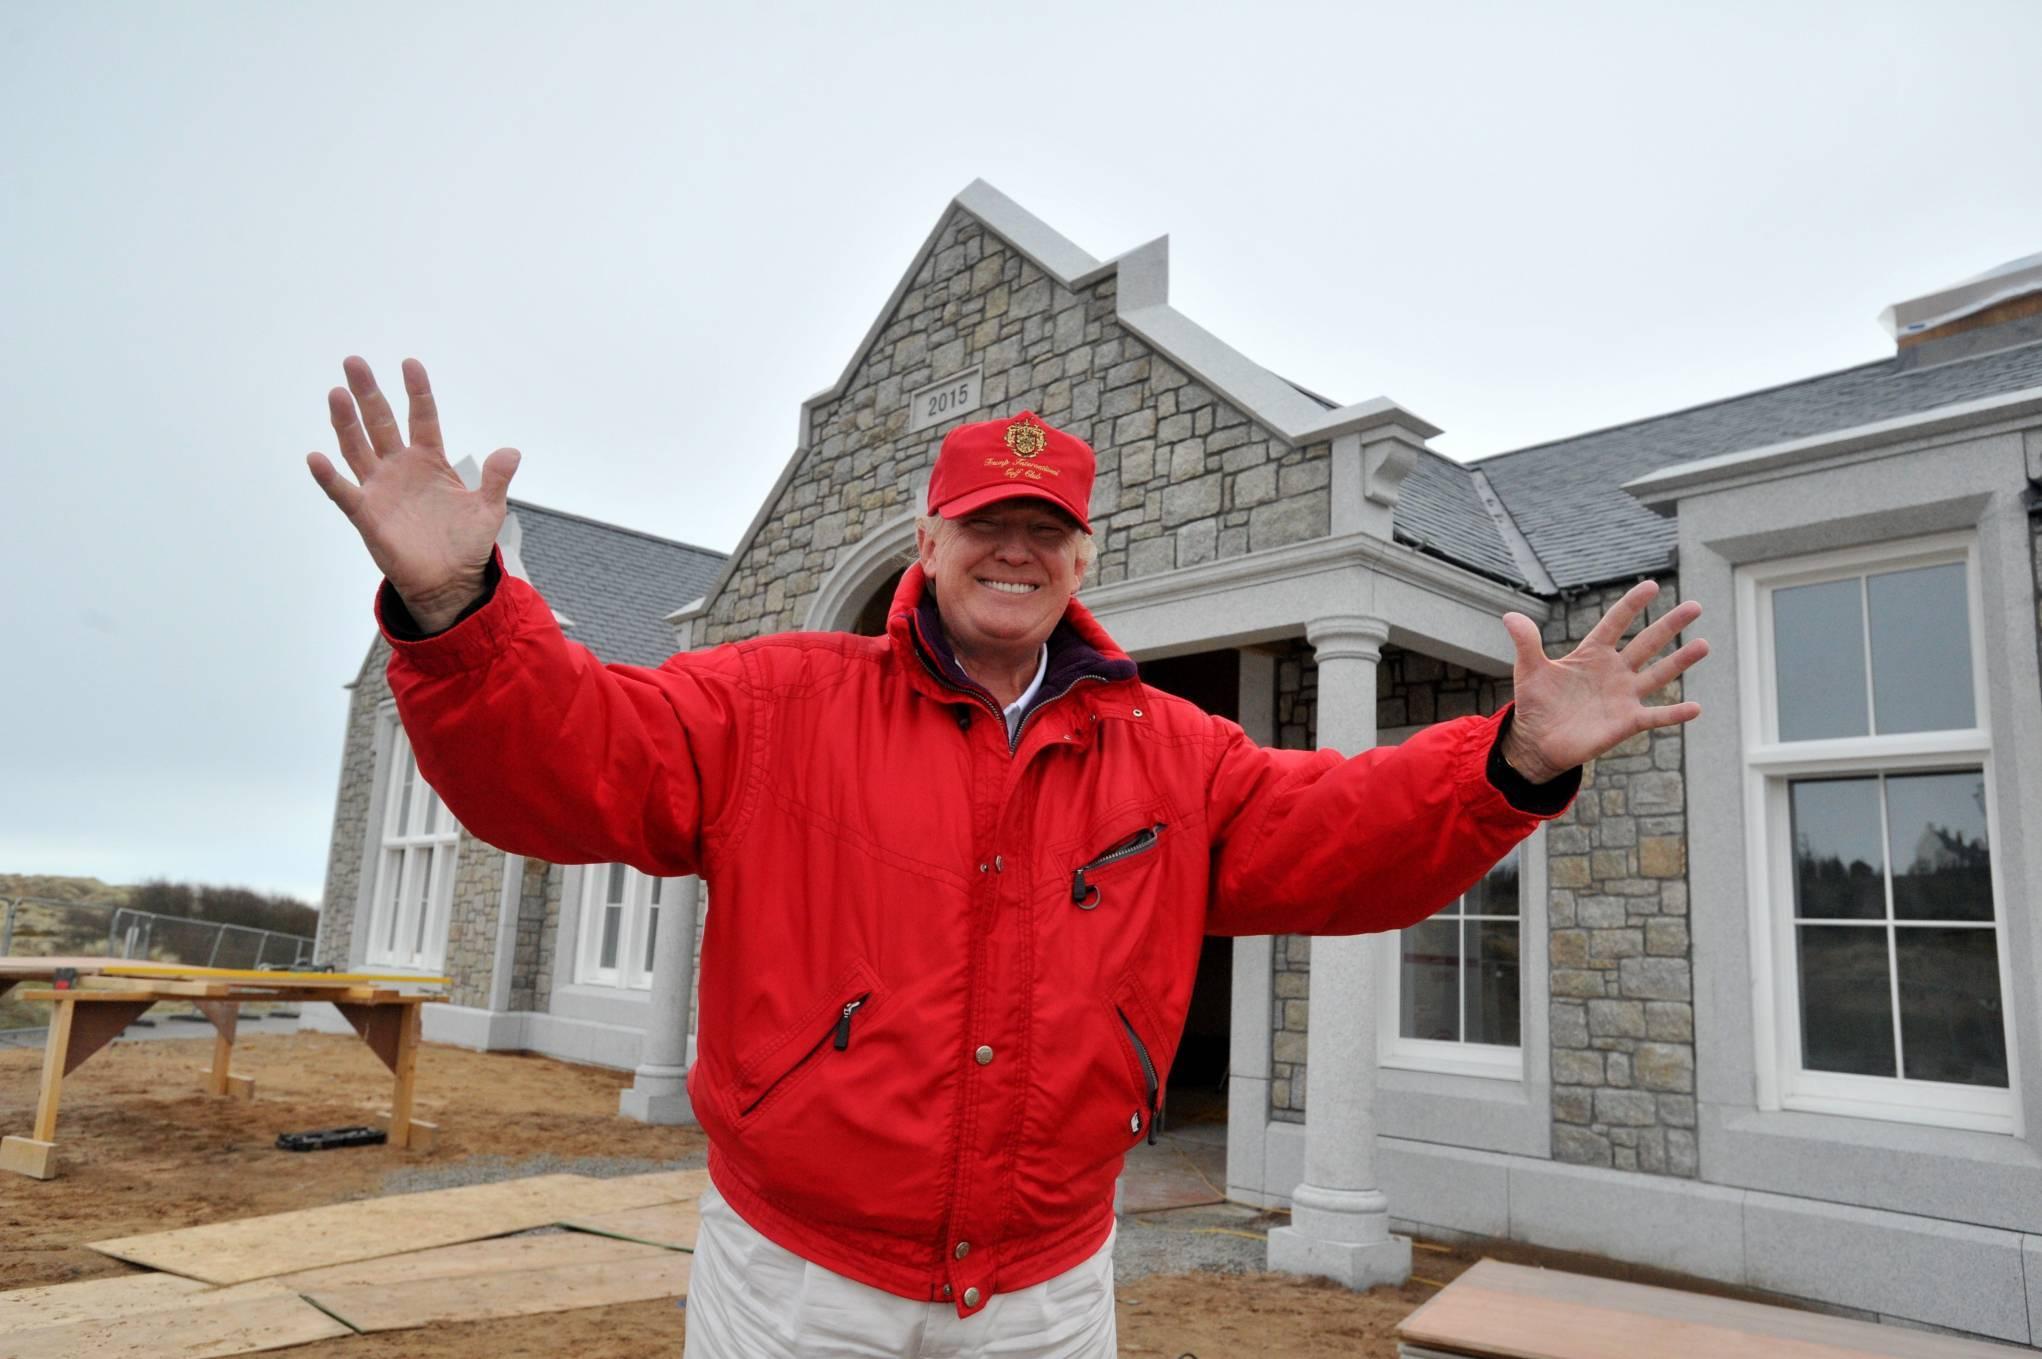 Donald Trump  at the Menie Estate.